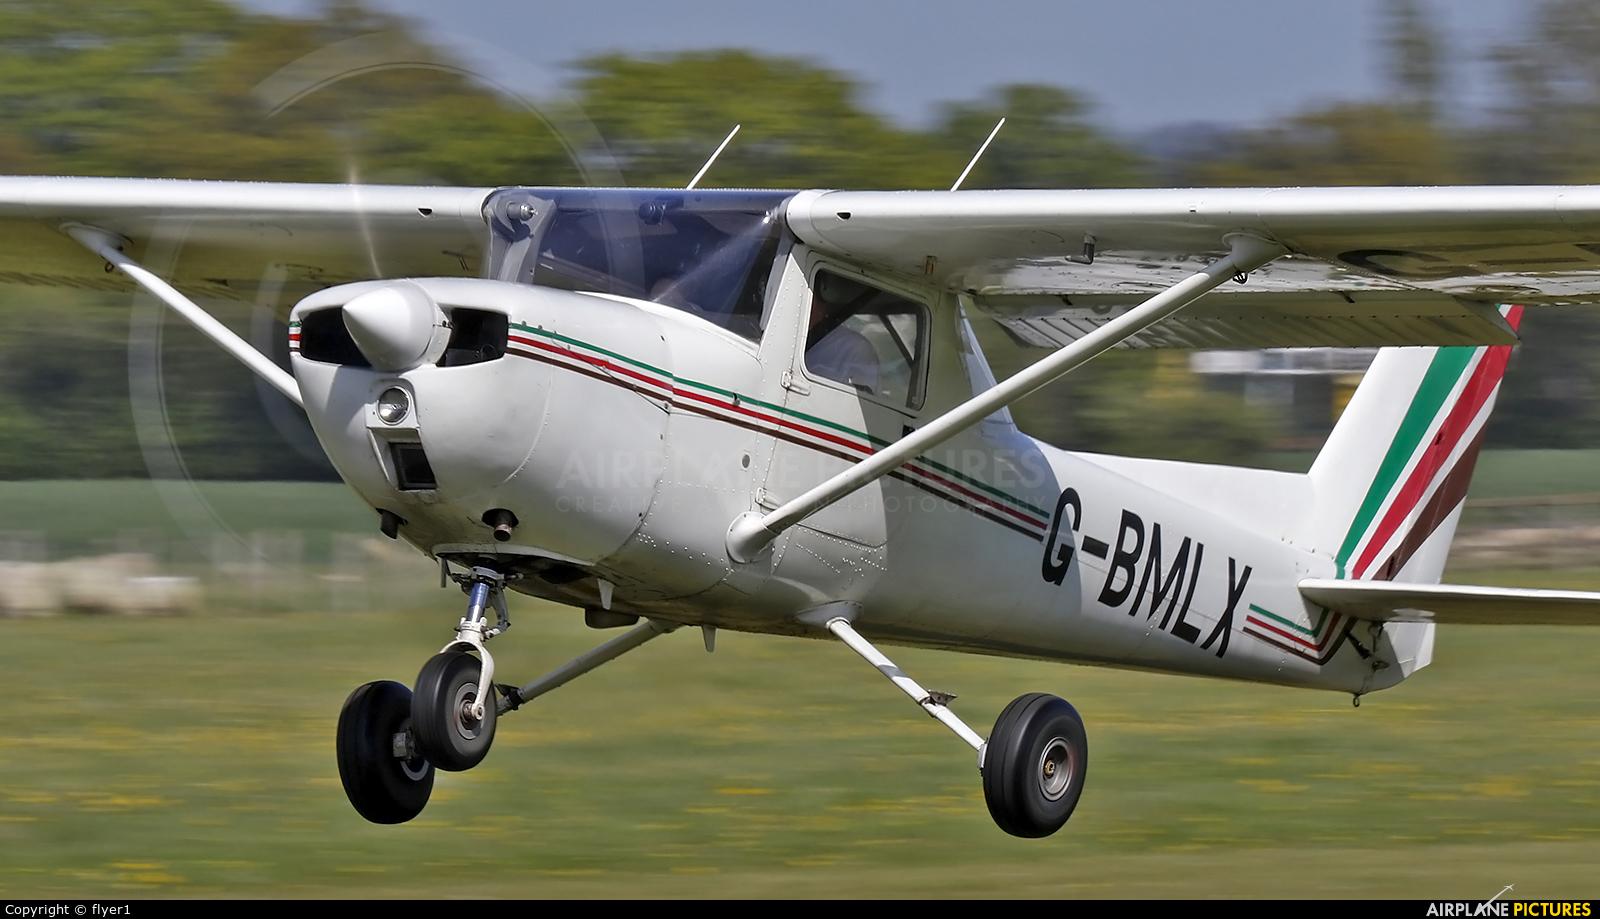 Private G-BMLX aircraft at Lashenden / Headcorn